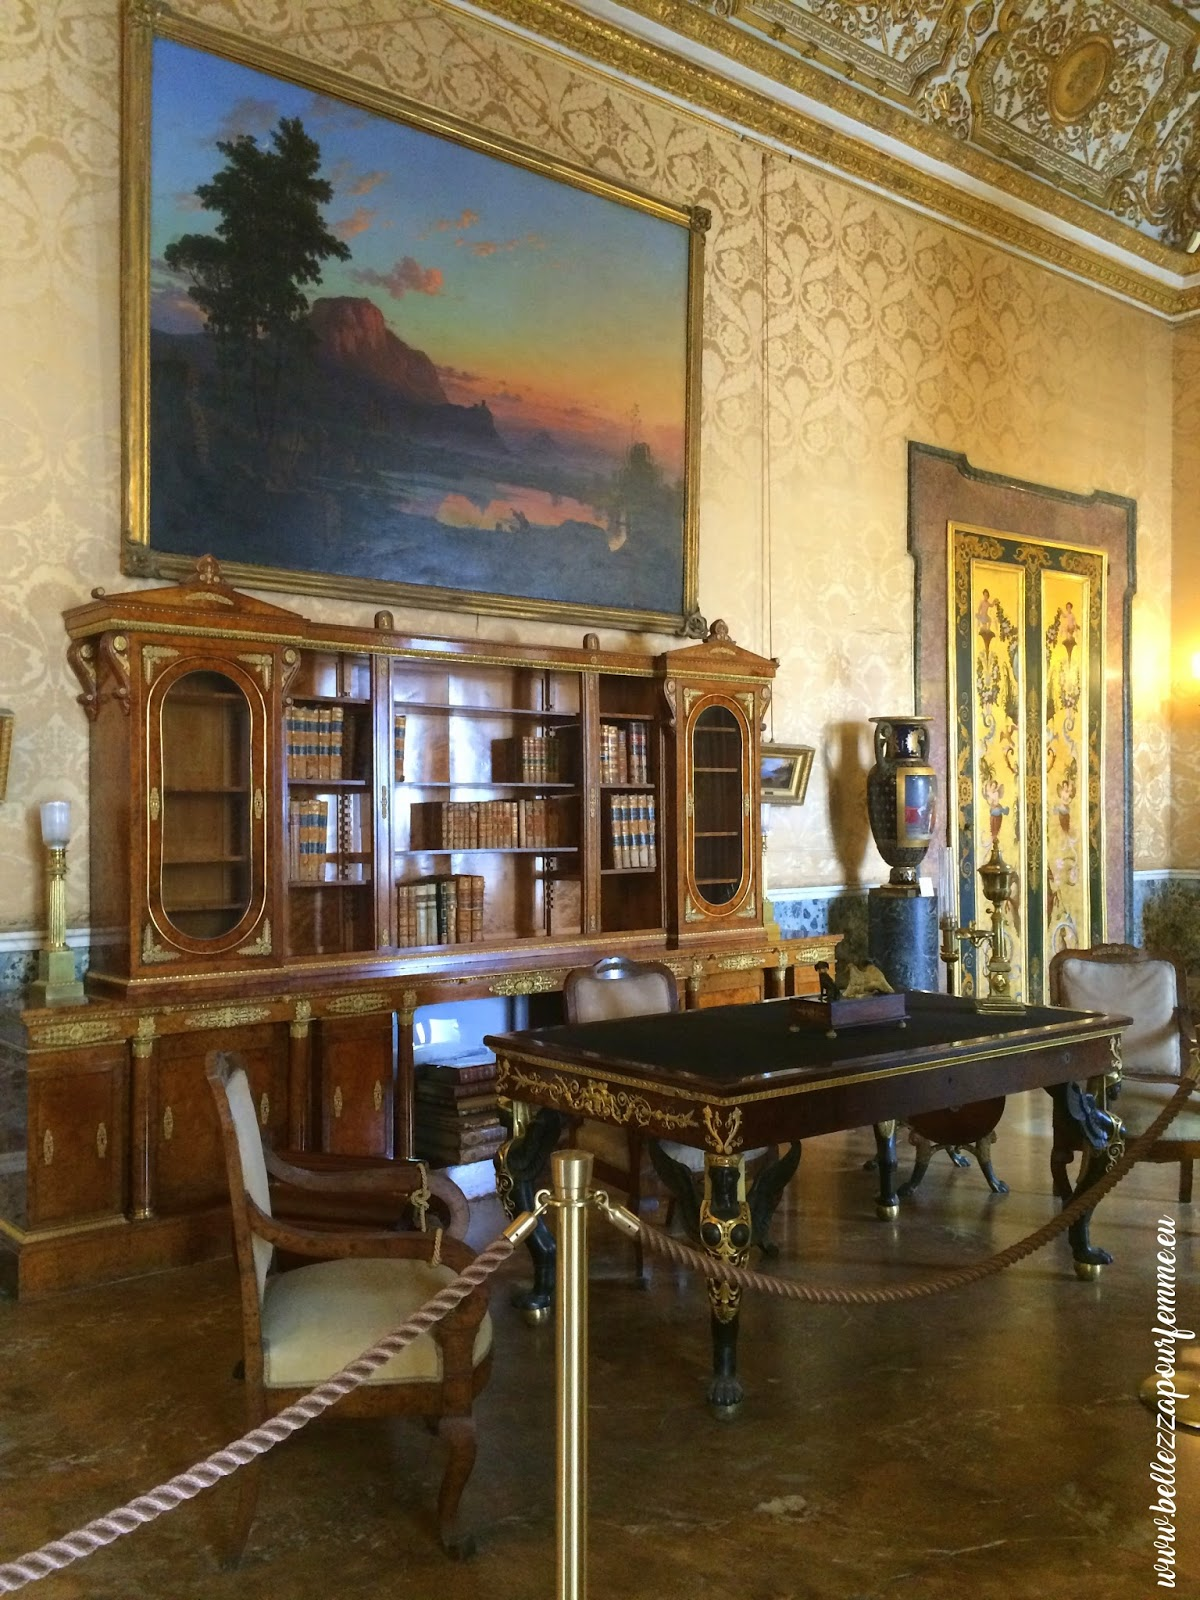 Visita al Palazzo Reale